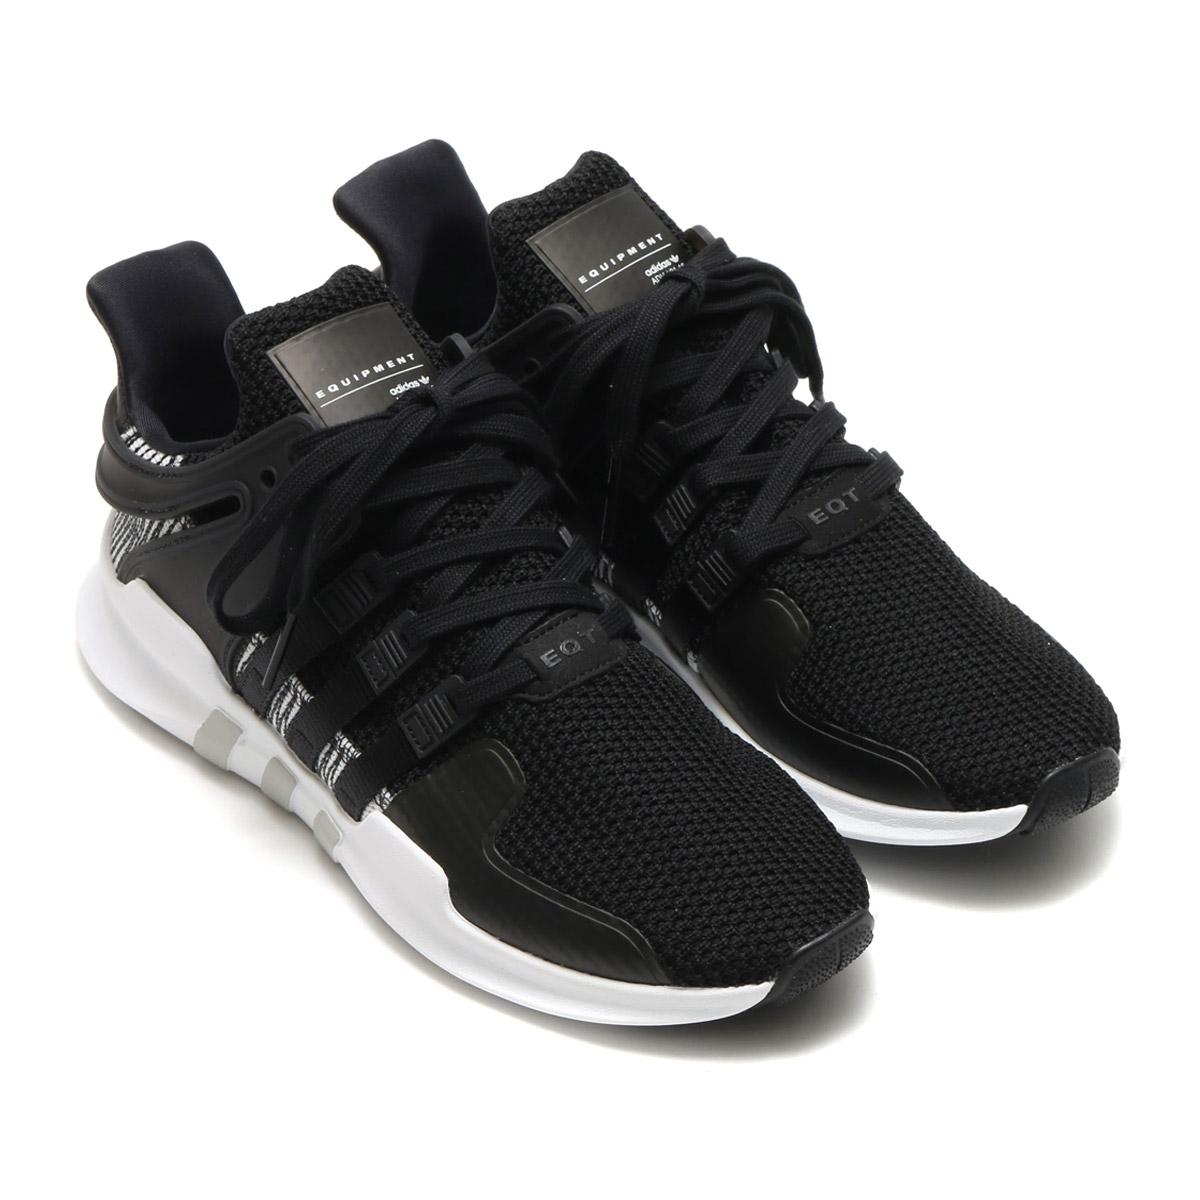 adidas Originals EQT SUPPORTADV(アディダス オリジナルス EQT サポートADV)CORE BLACK/CORE BLACK/RUNNING WHITE【メンズ スニーカー】17FW-I